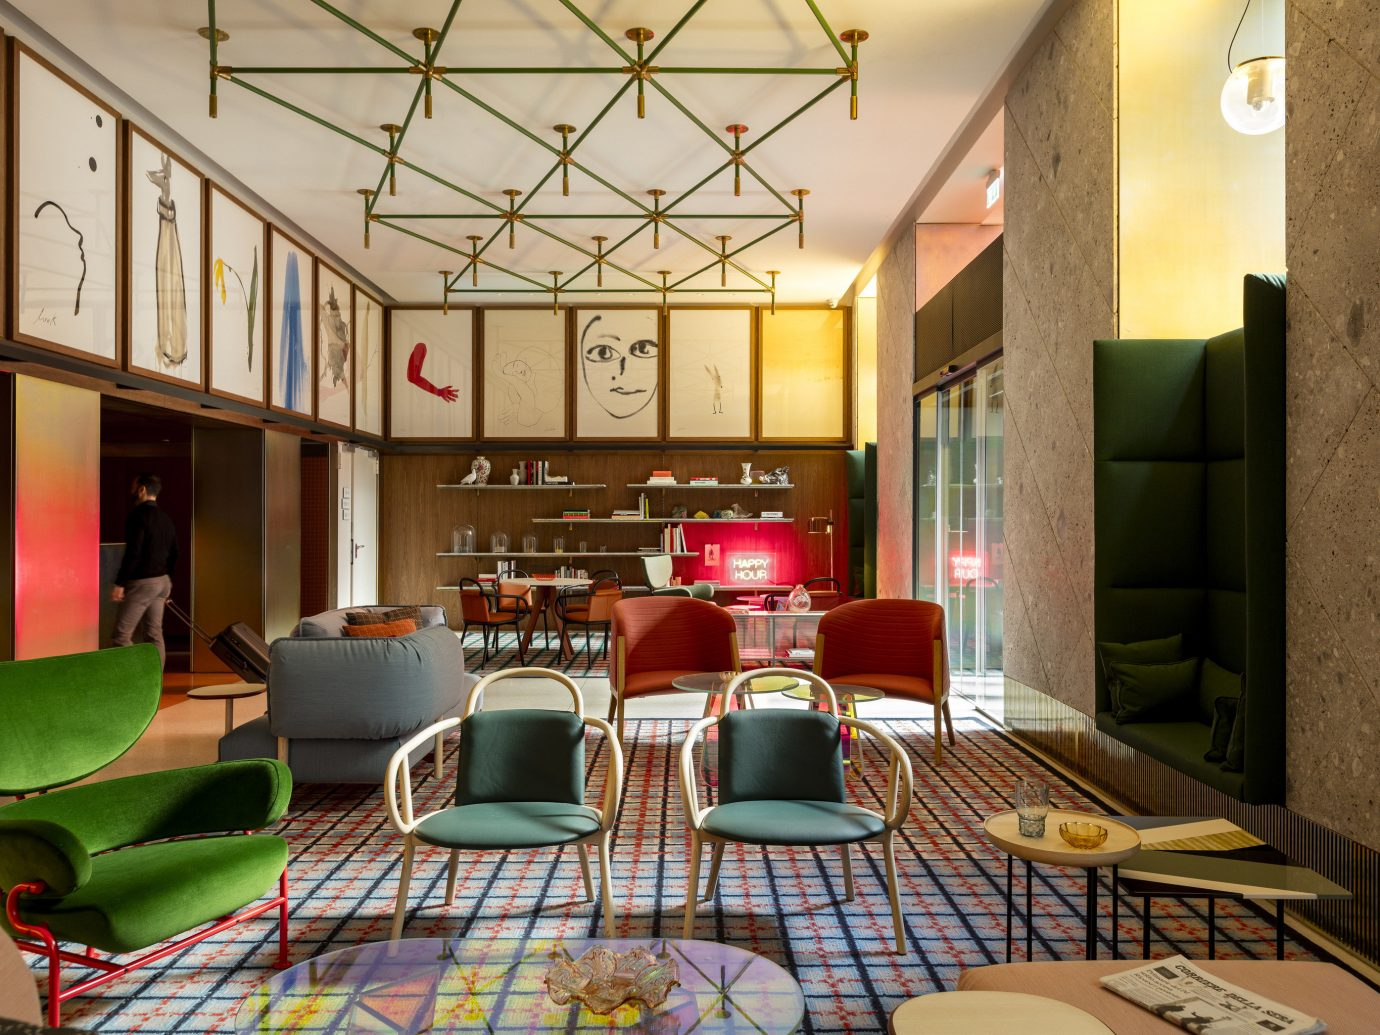 Hotels Italy Milan Offbeat indoor property room Lobby restaurant interior design estate Design real estate living room recreation room